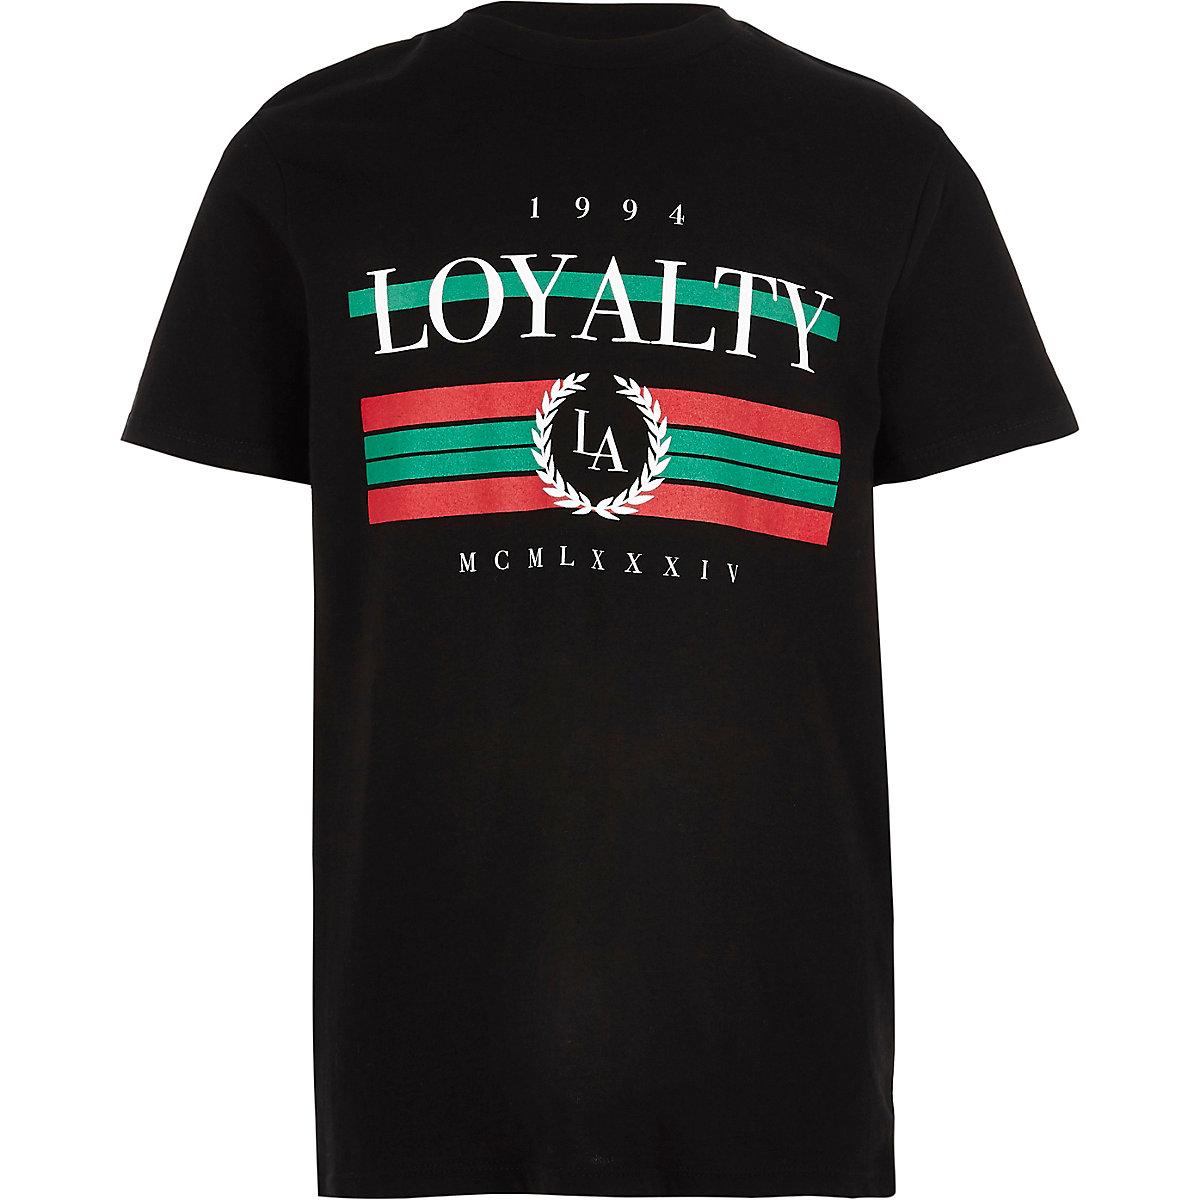 Boys black 'Loyalty' print T-shirt